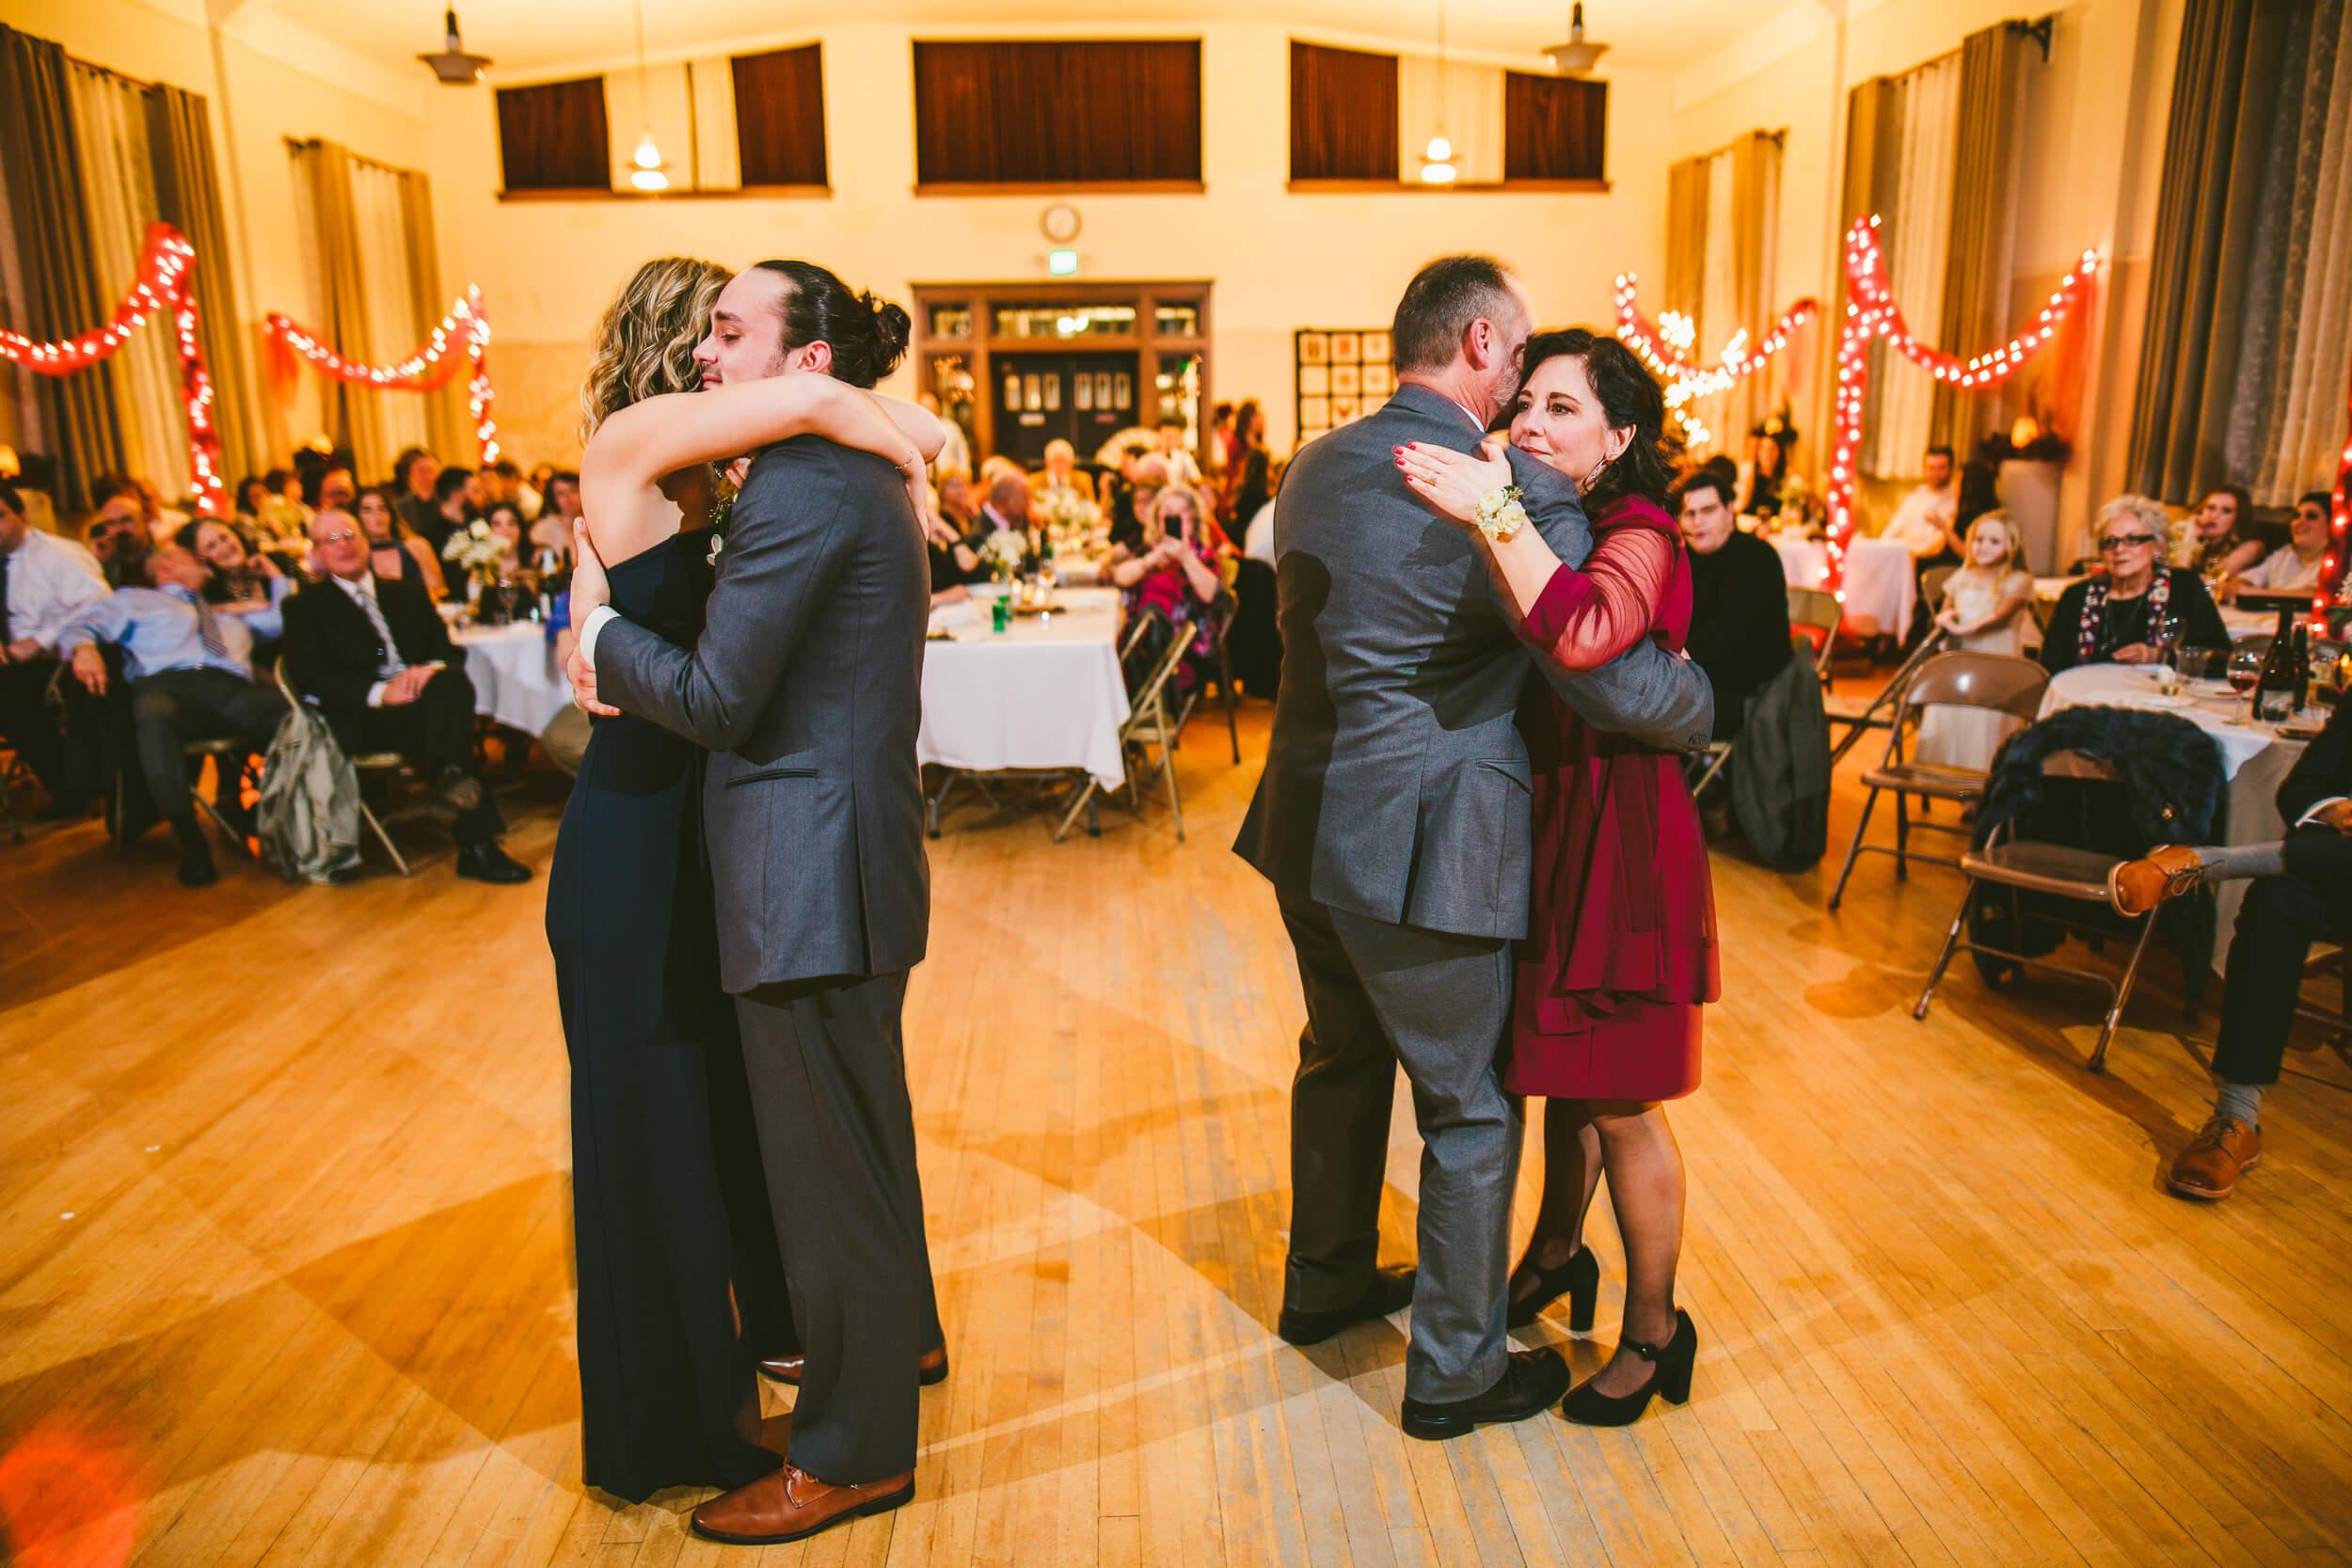 mukogawa winter wedding in spokane (282).jpg